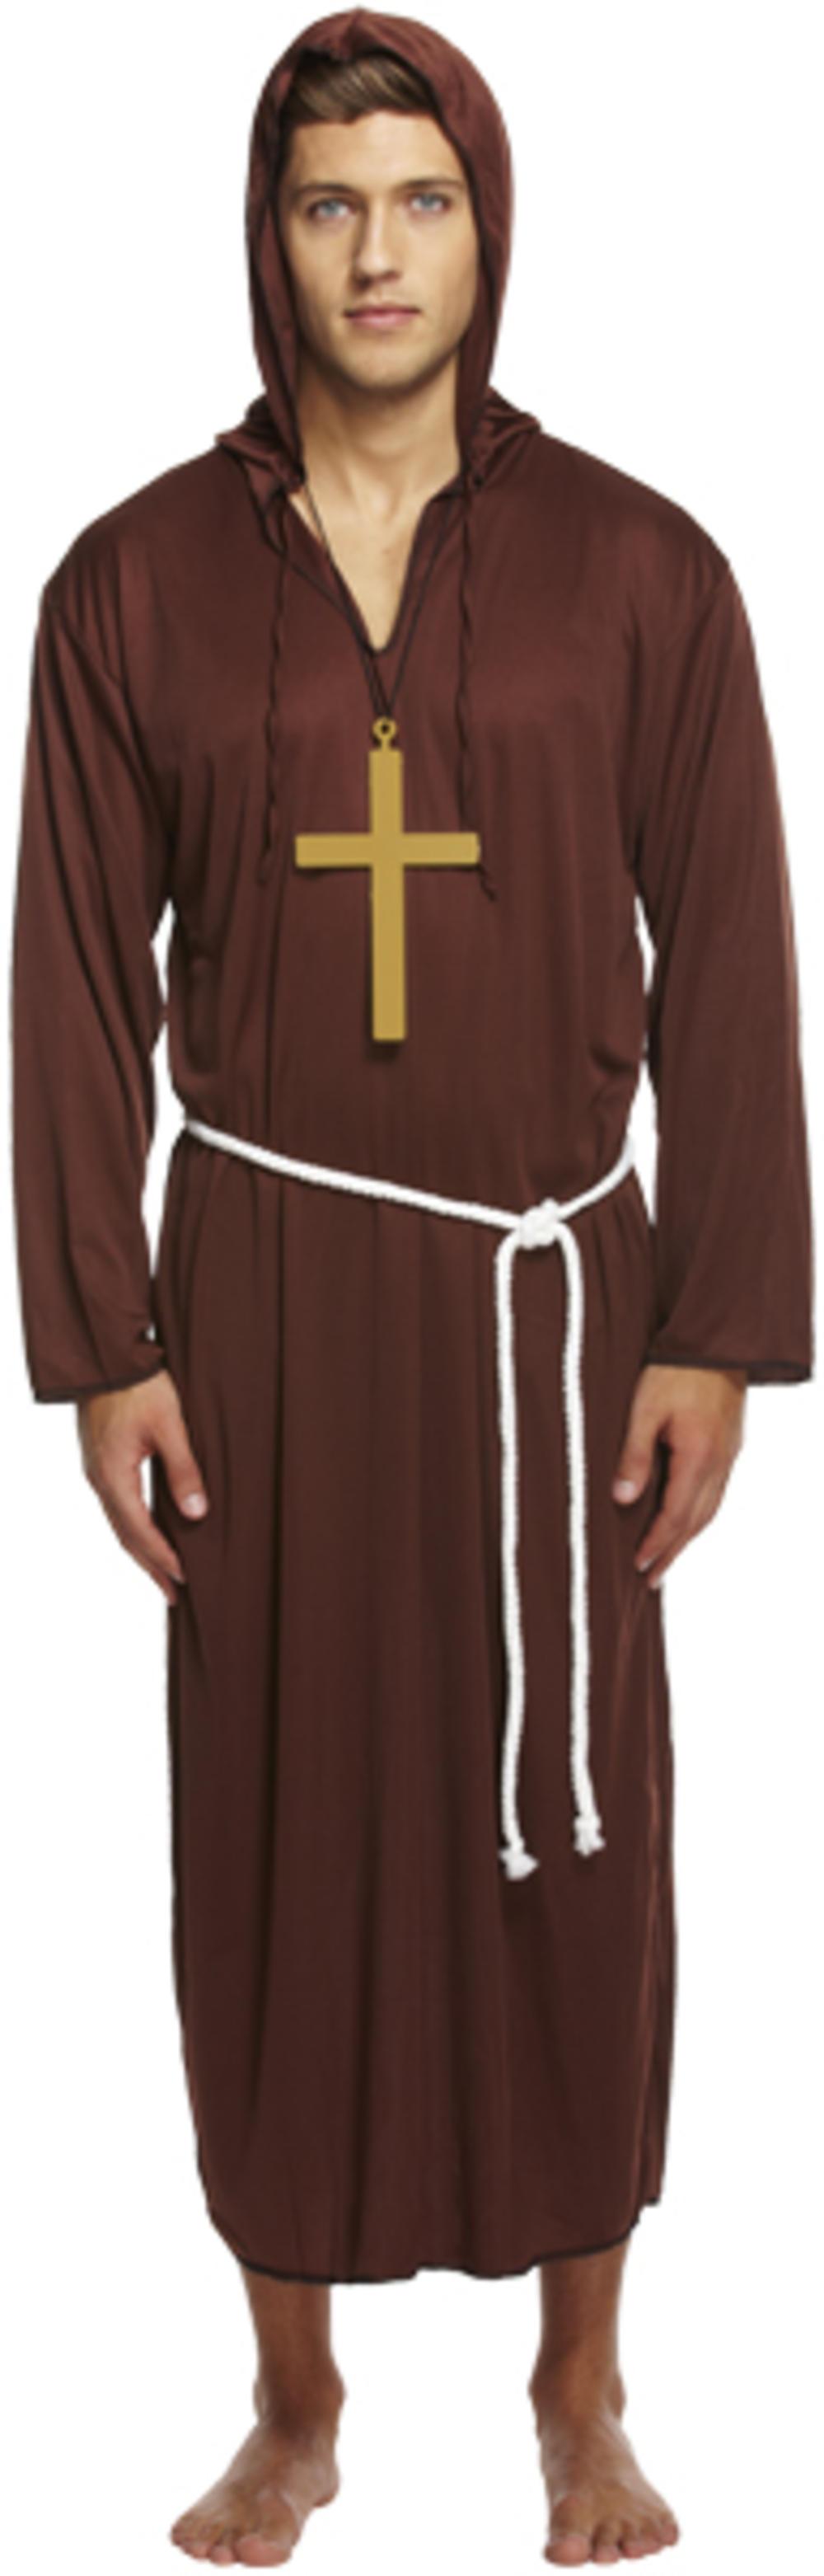 Monk Mens Costume